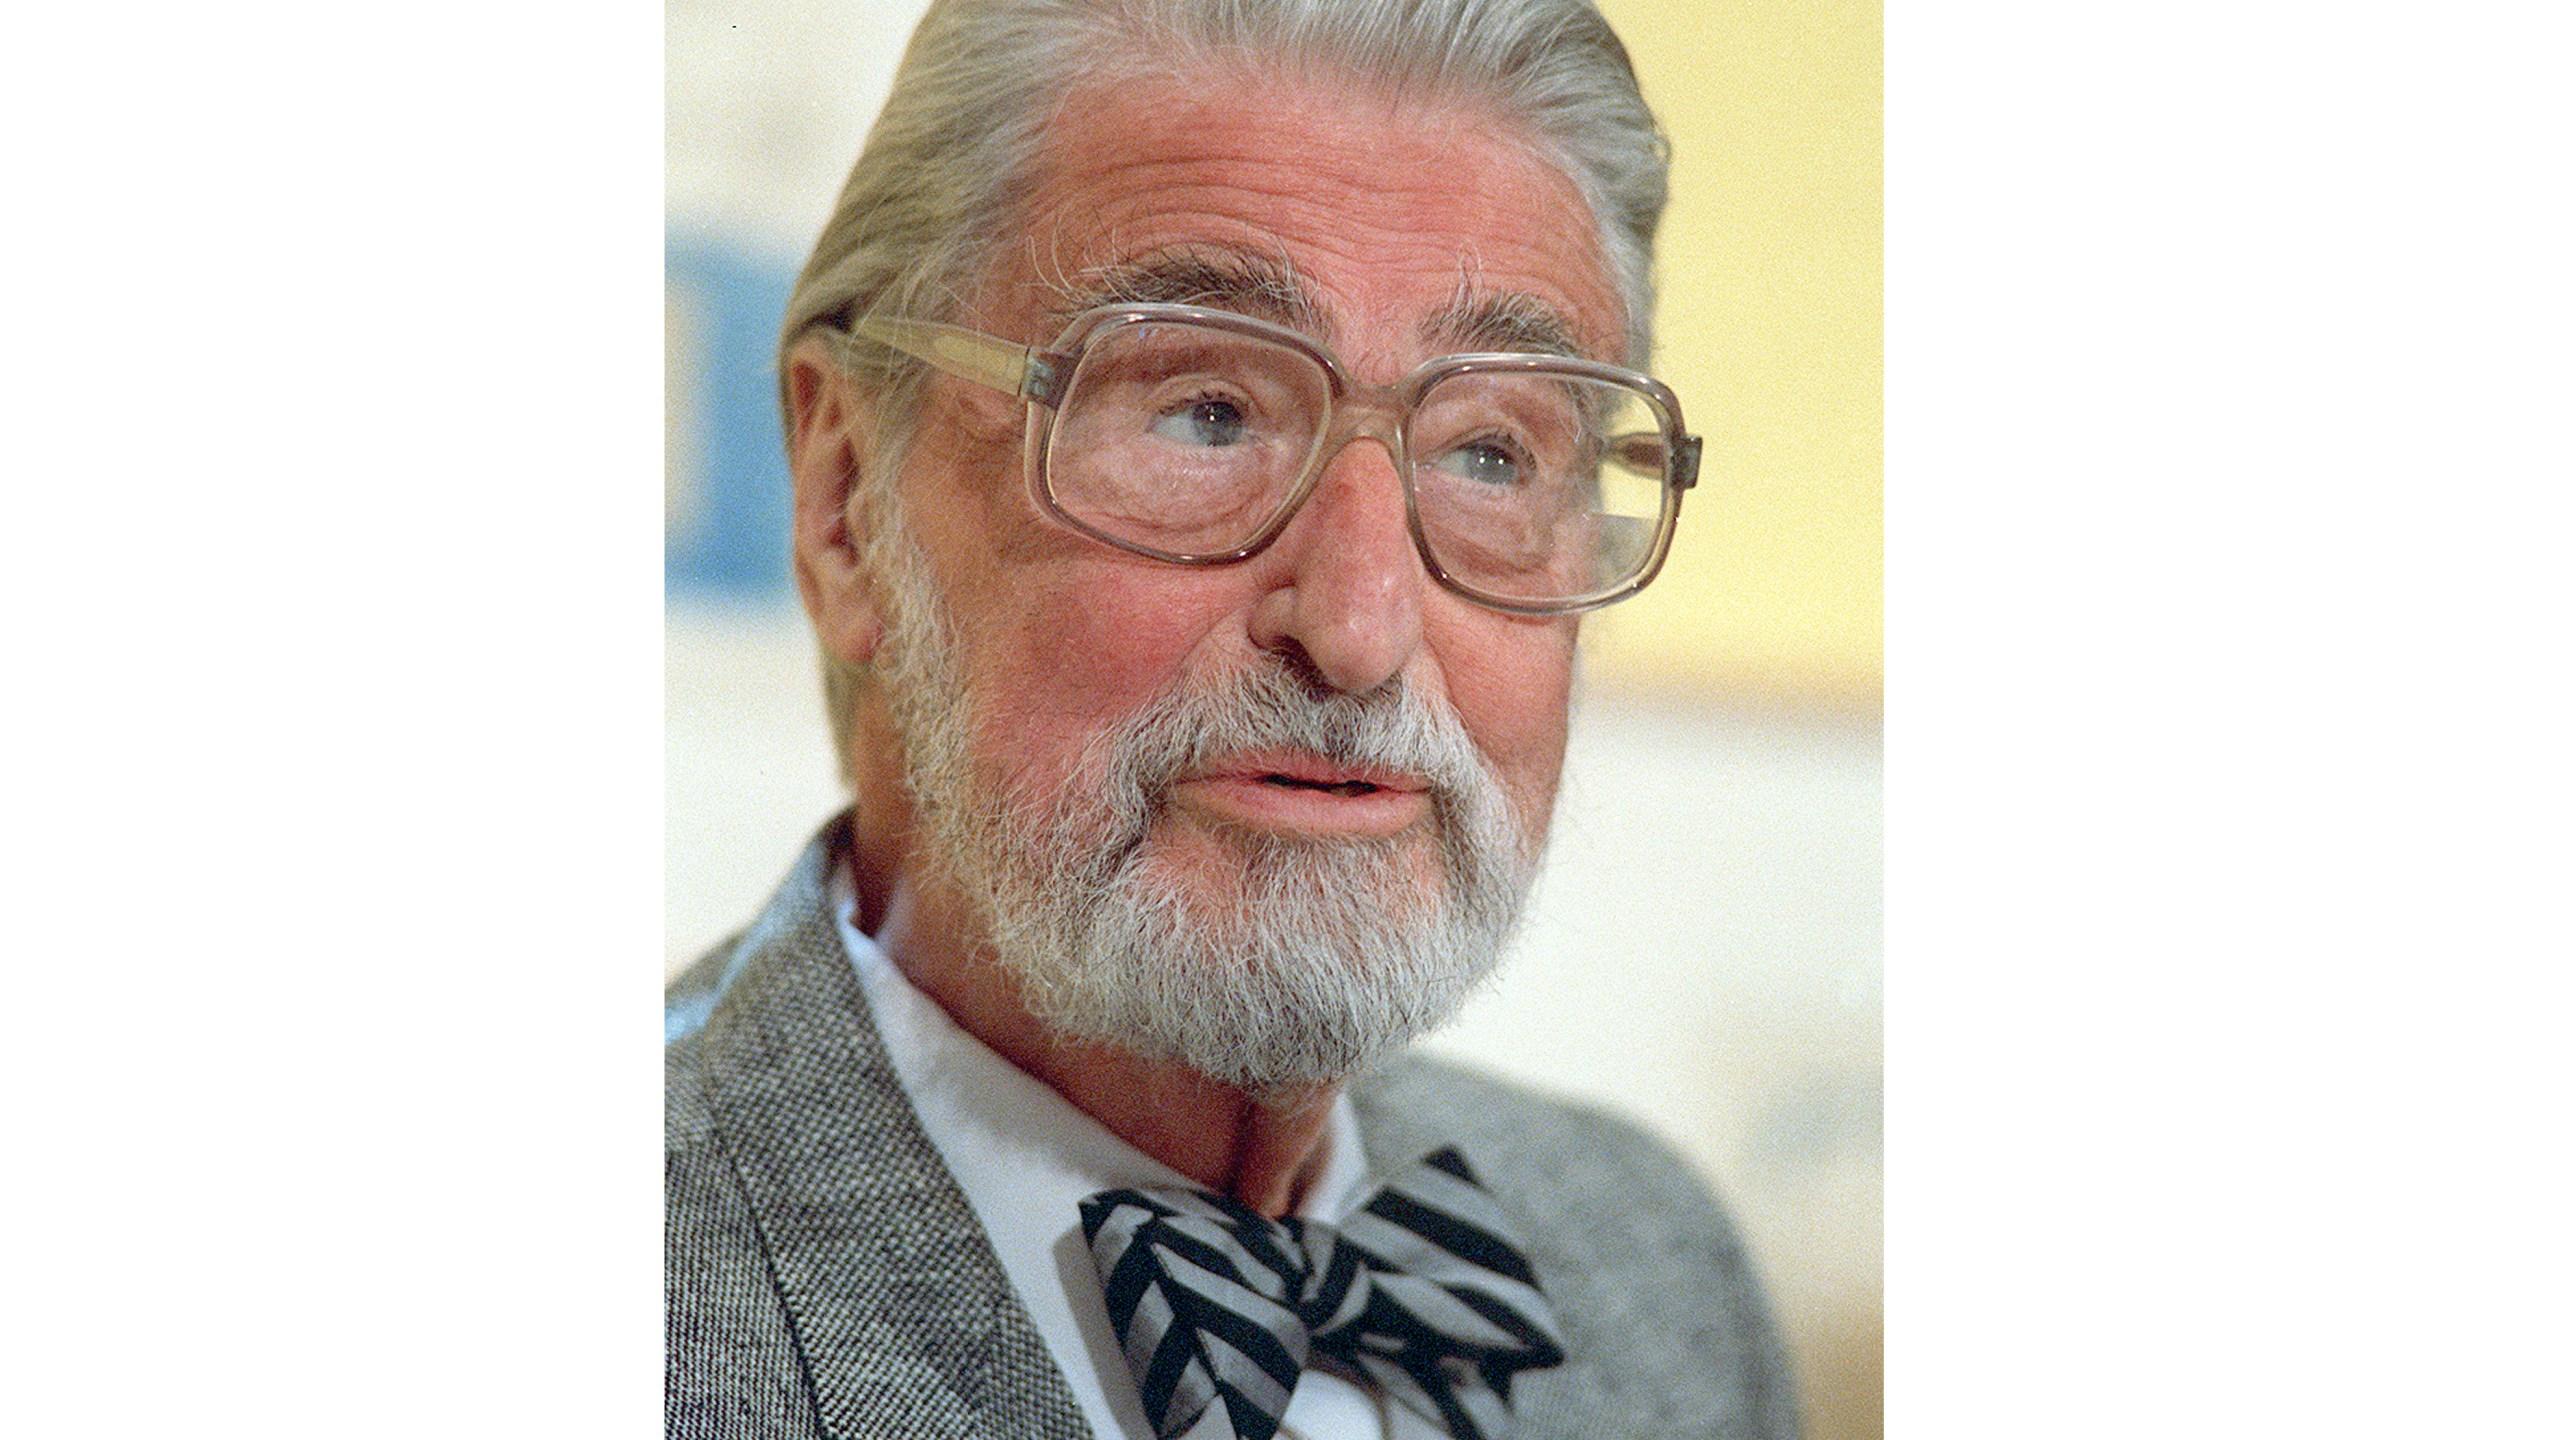 Dr. Seuss, Theodor Geisel